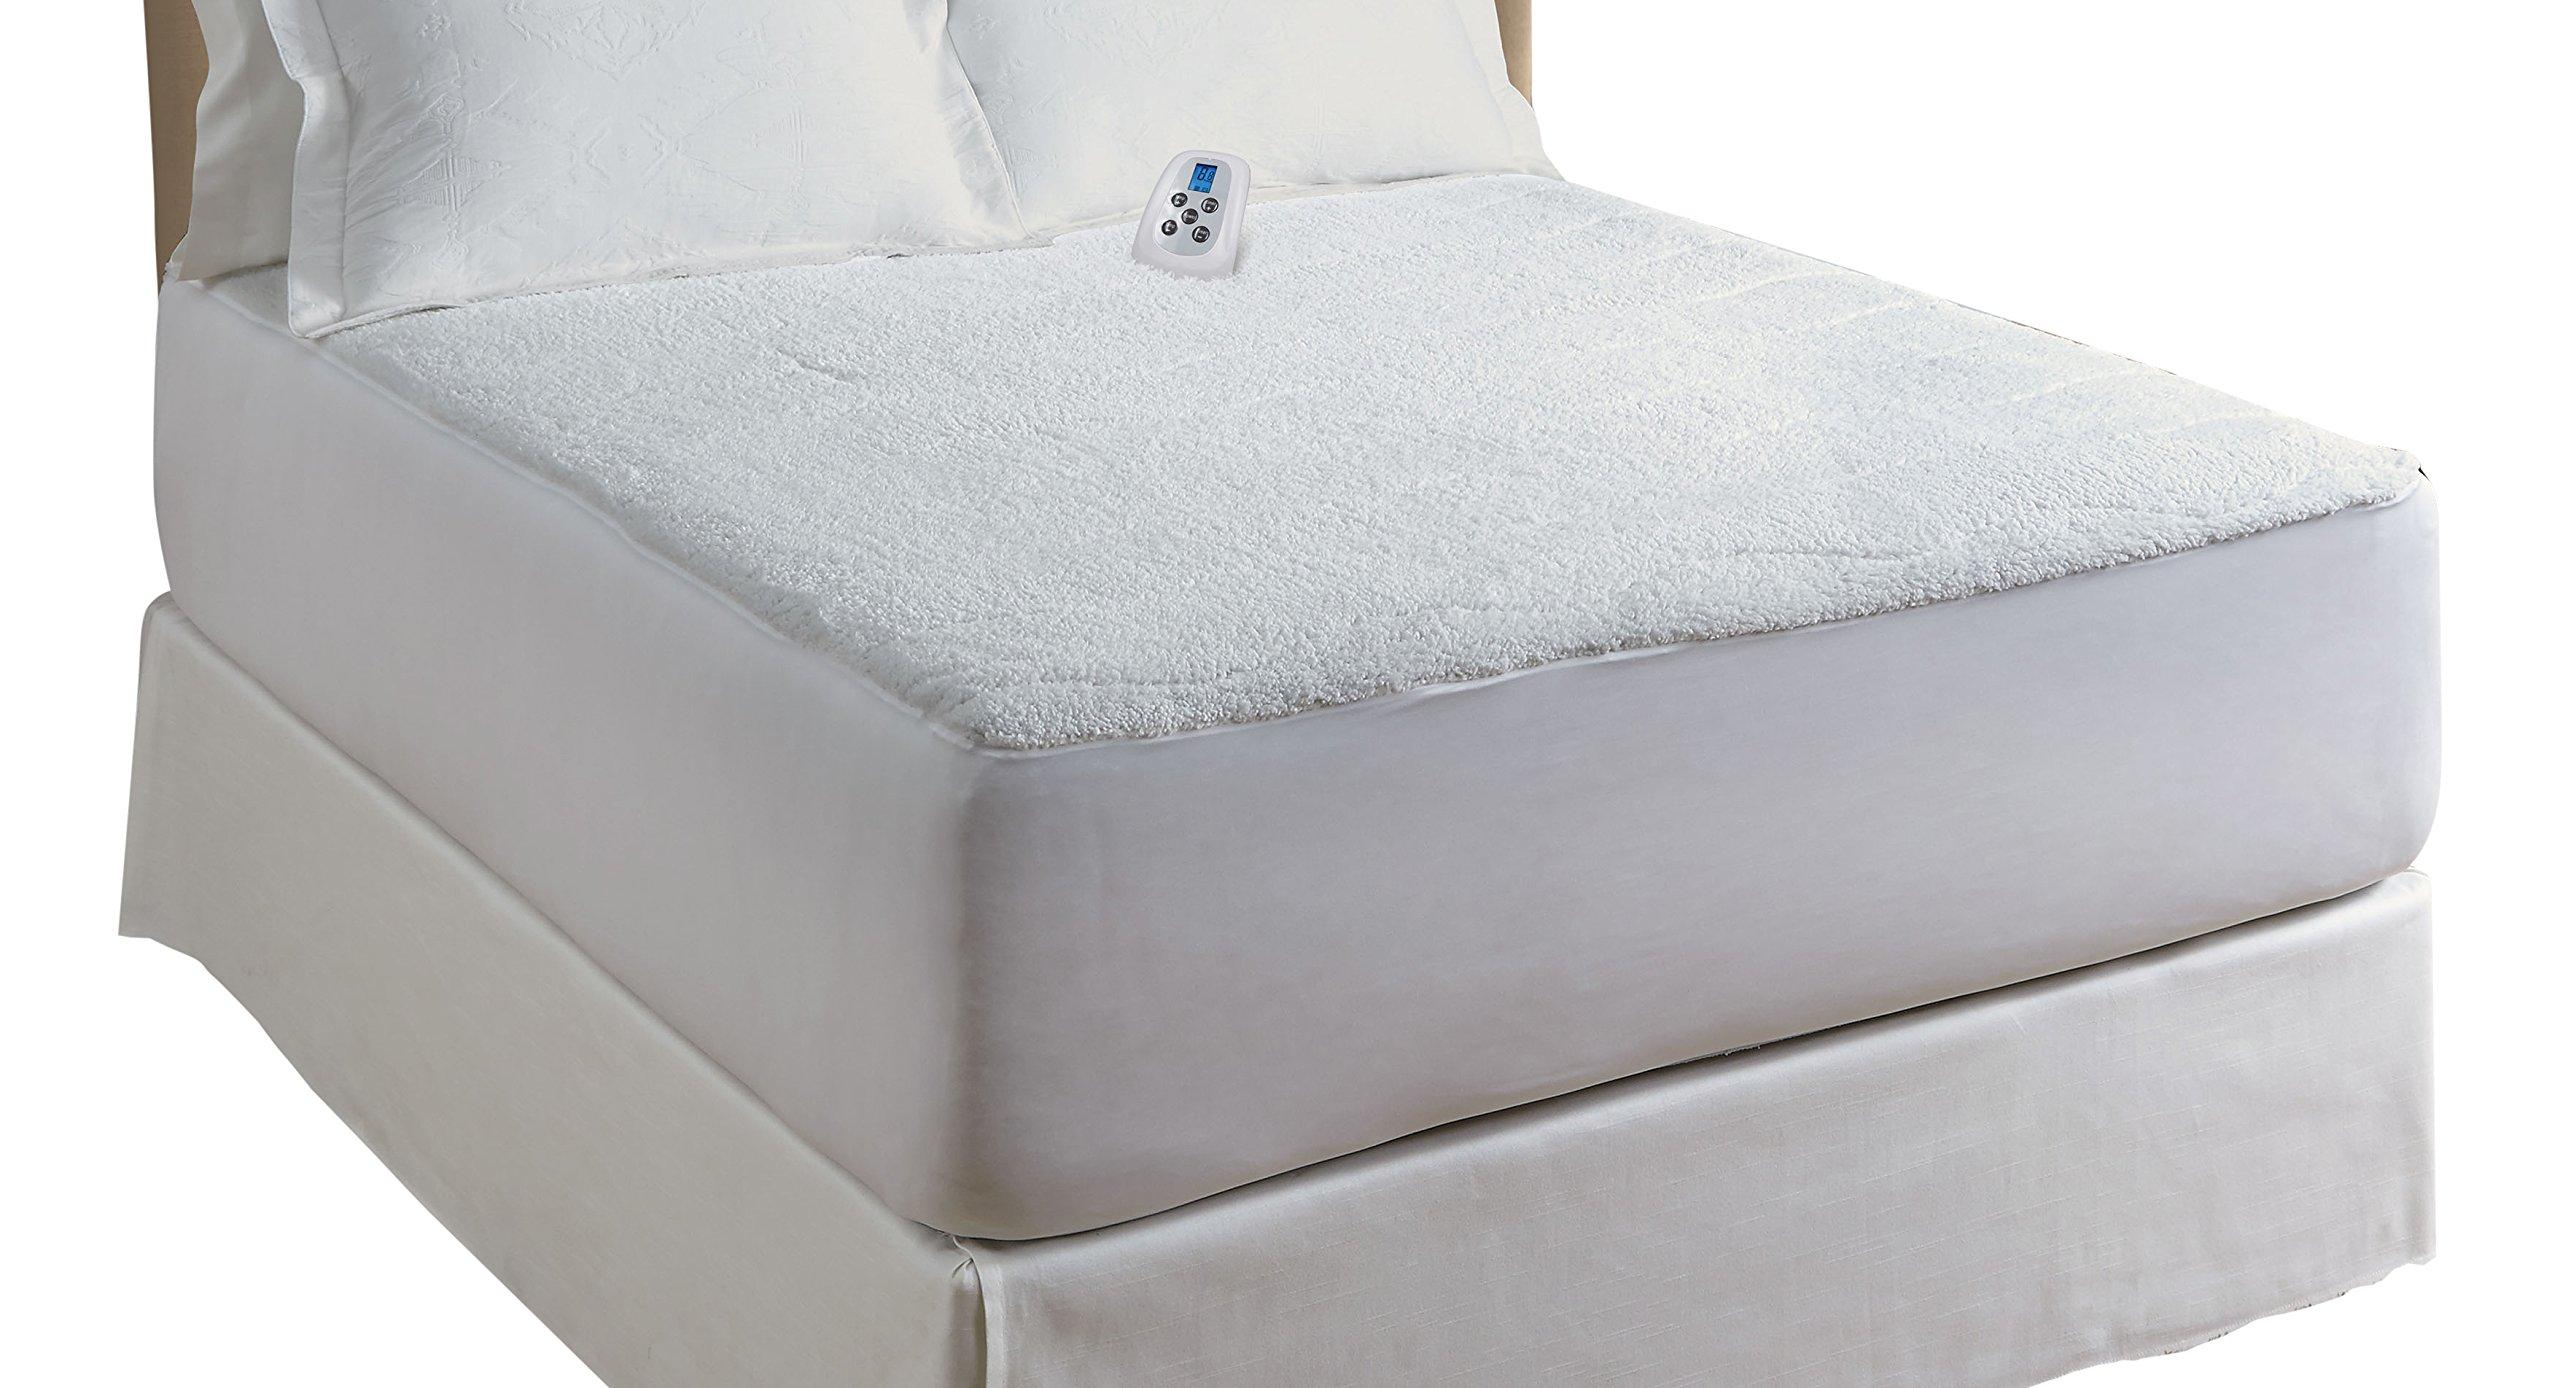 Serta Sherpa Plush Electric Heated Mattress Pad with Programmable Digital Controller, King Size, White